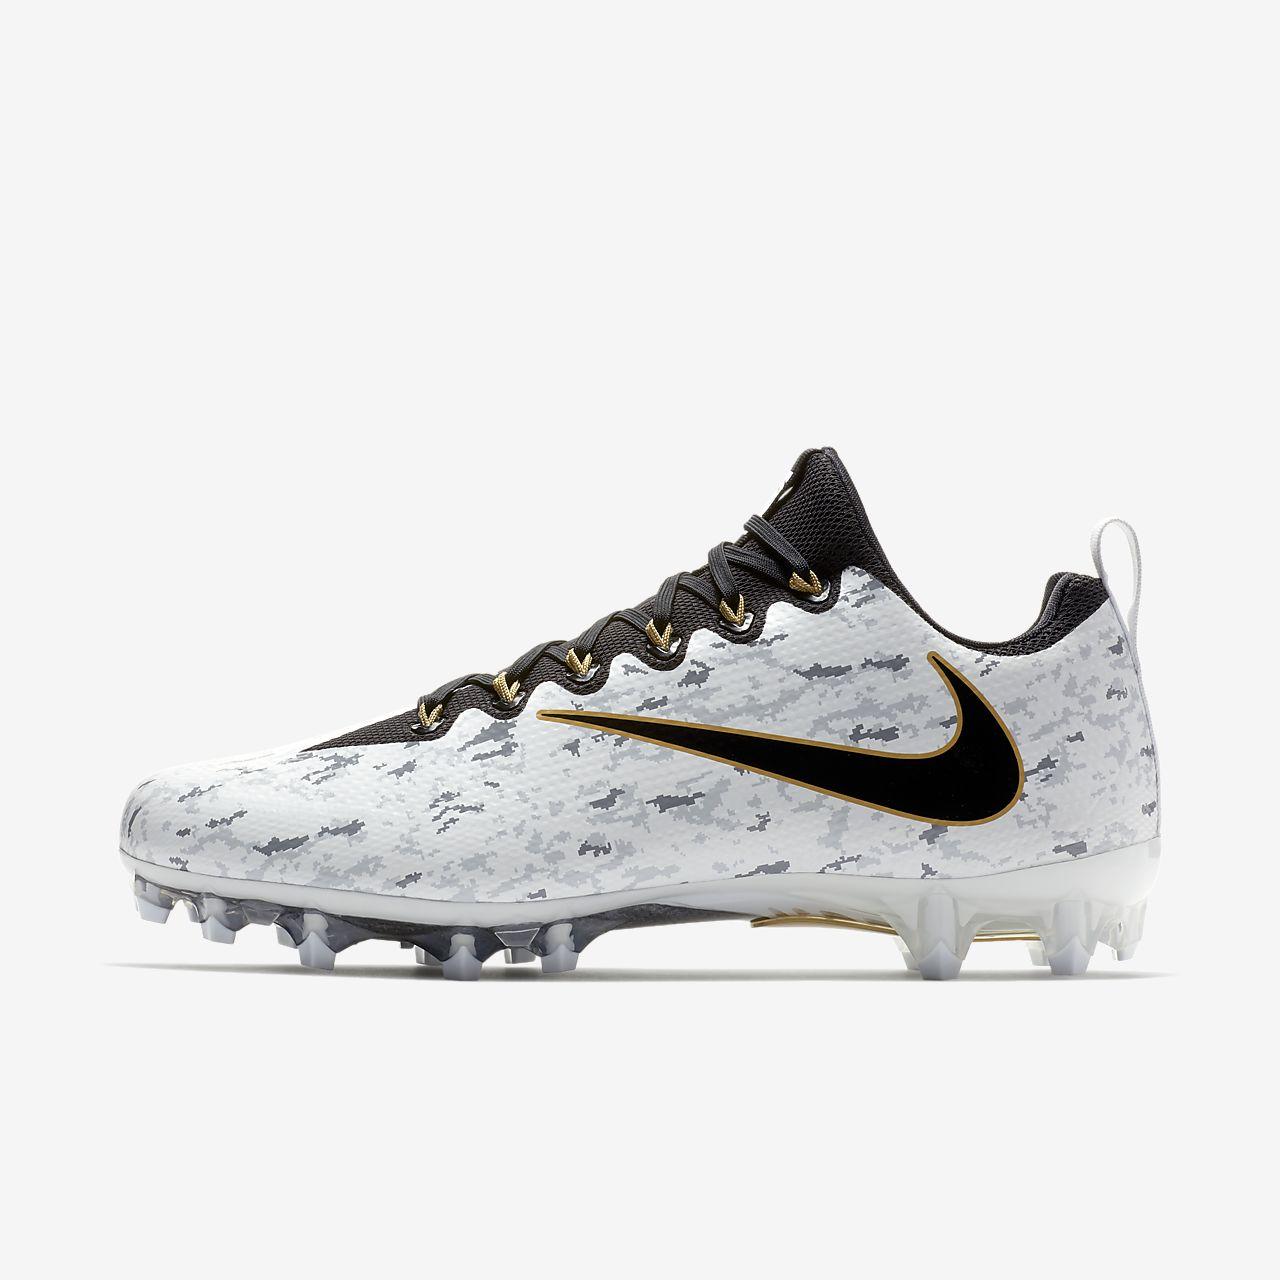 nike free run sneakers womens white low top nike football cleats